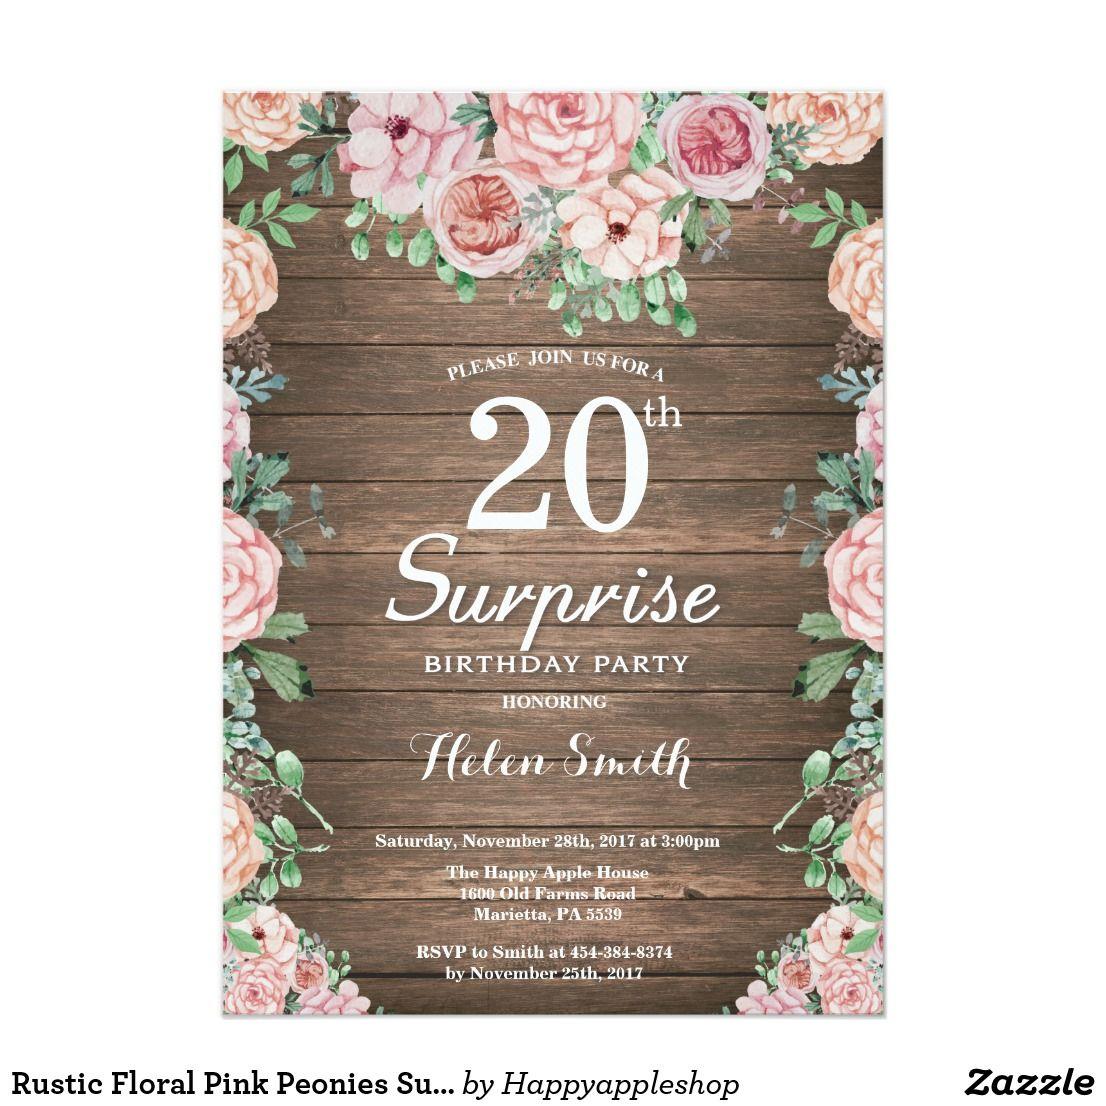 Rustic Floral Pink Peonies Surprise 20th Birthday